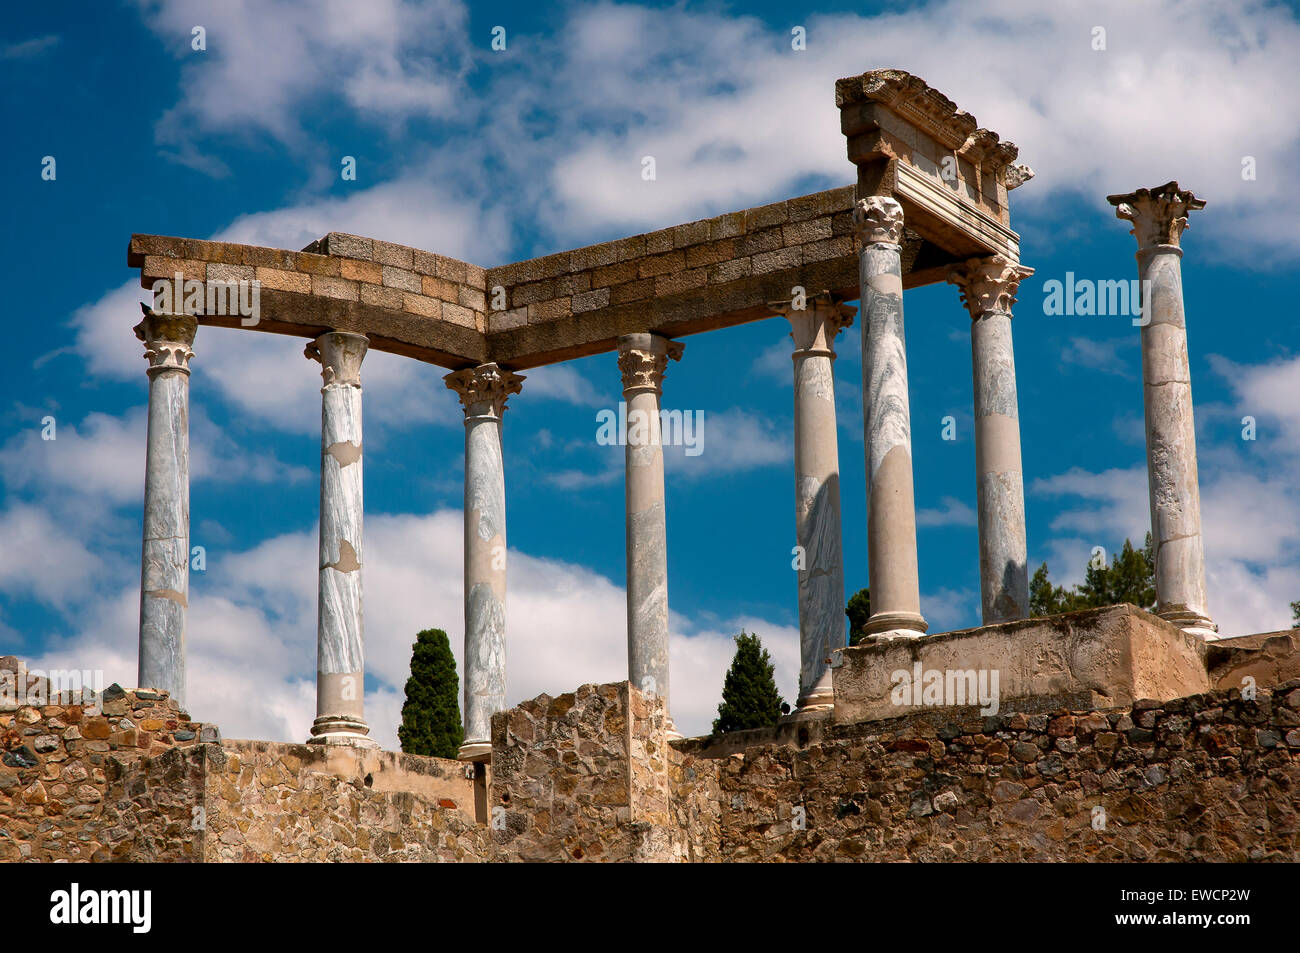 Roman theater- detail columns, Merida, Badajoz province, Region of Extremadura, Spain, Europe - Stock Image